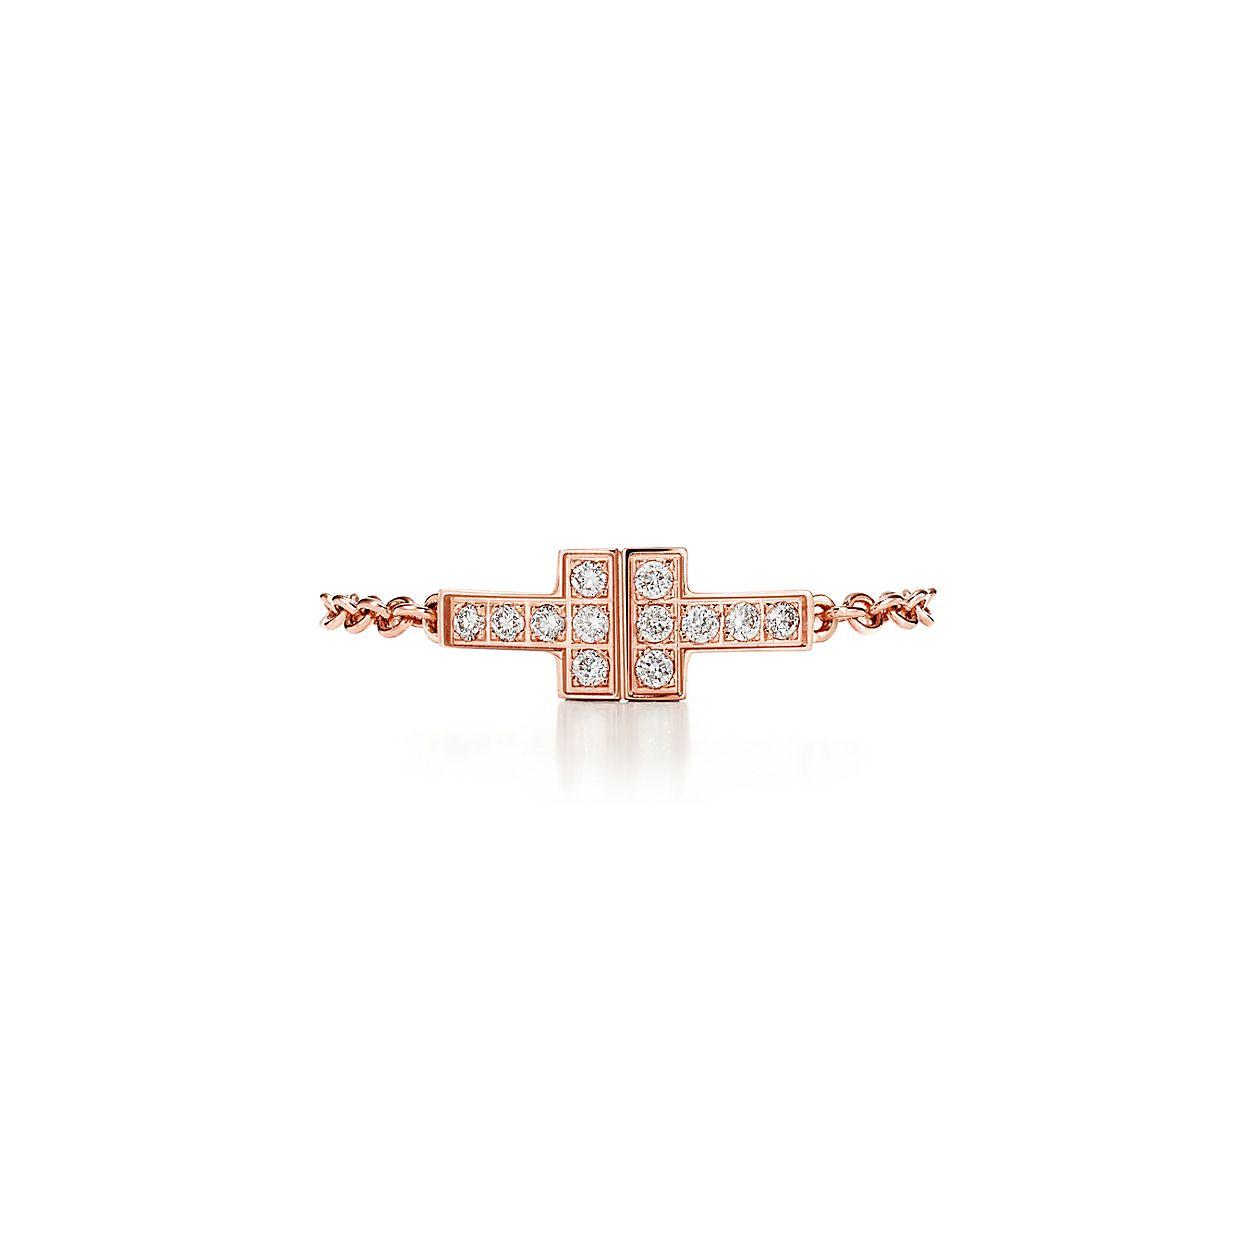 Bague chaîne Two Tiffany T en or rose 18 carats avec diamants ... c1ae64694fdc